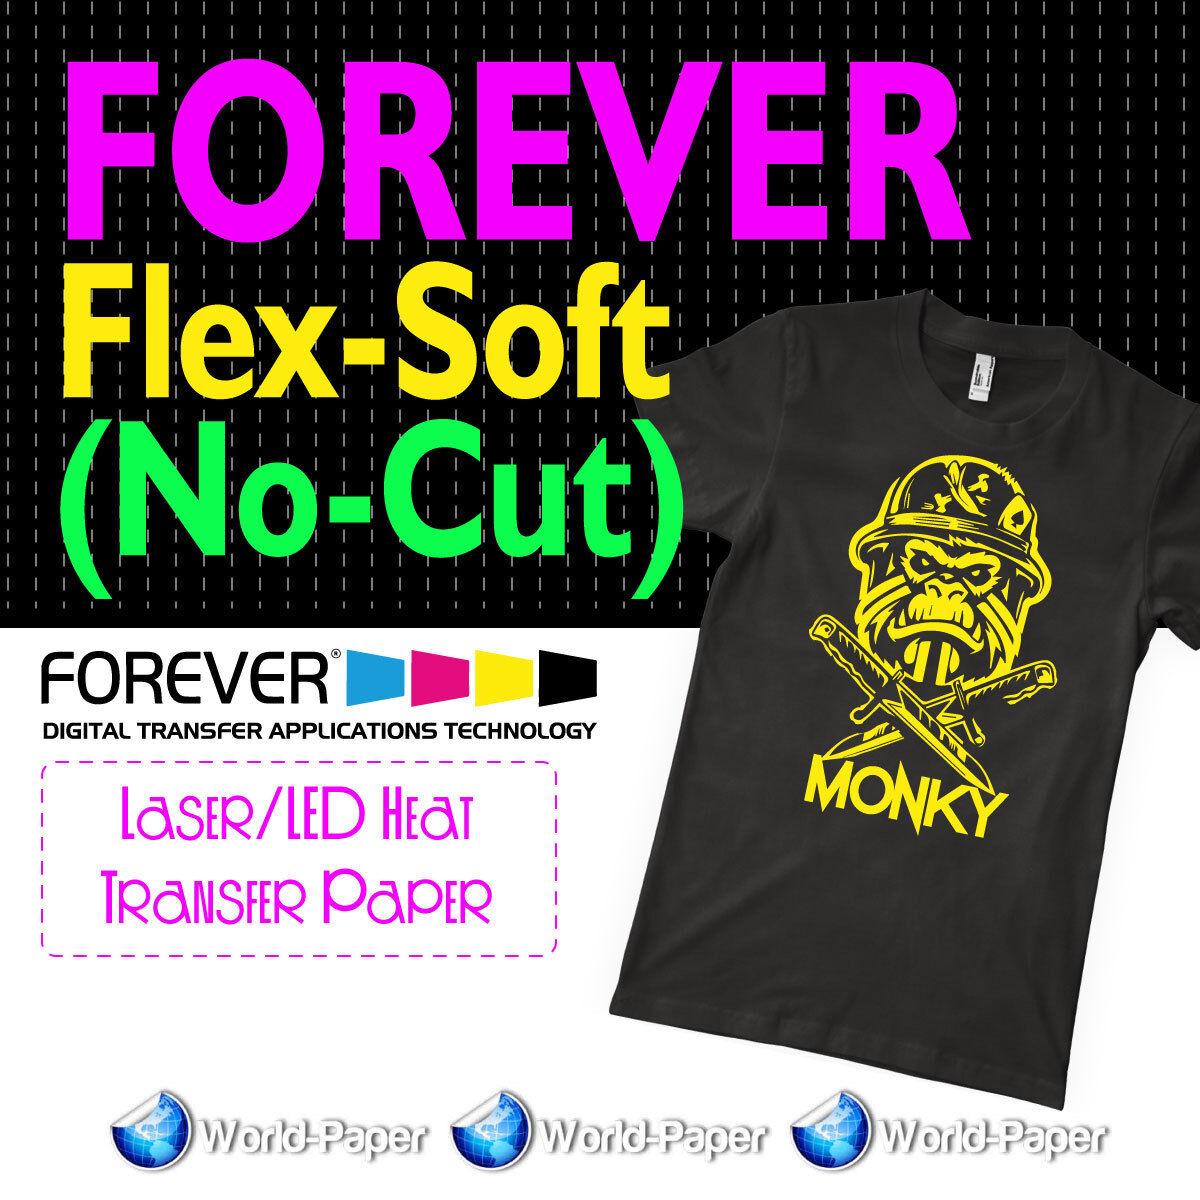 "FOREVER Flex-Soft  Laser/LED Heat Transfer Paper 8.5""x11"" 11"